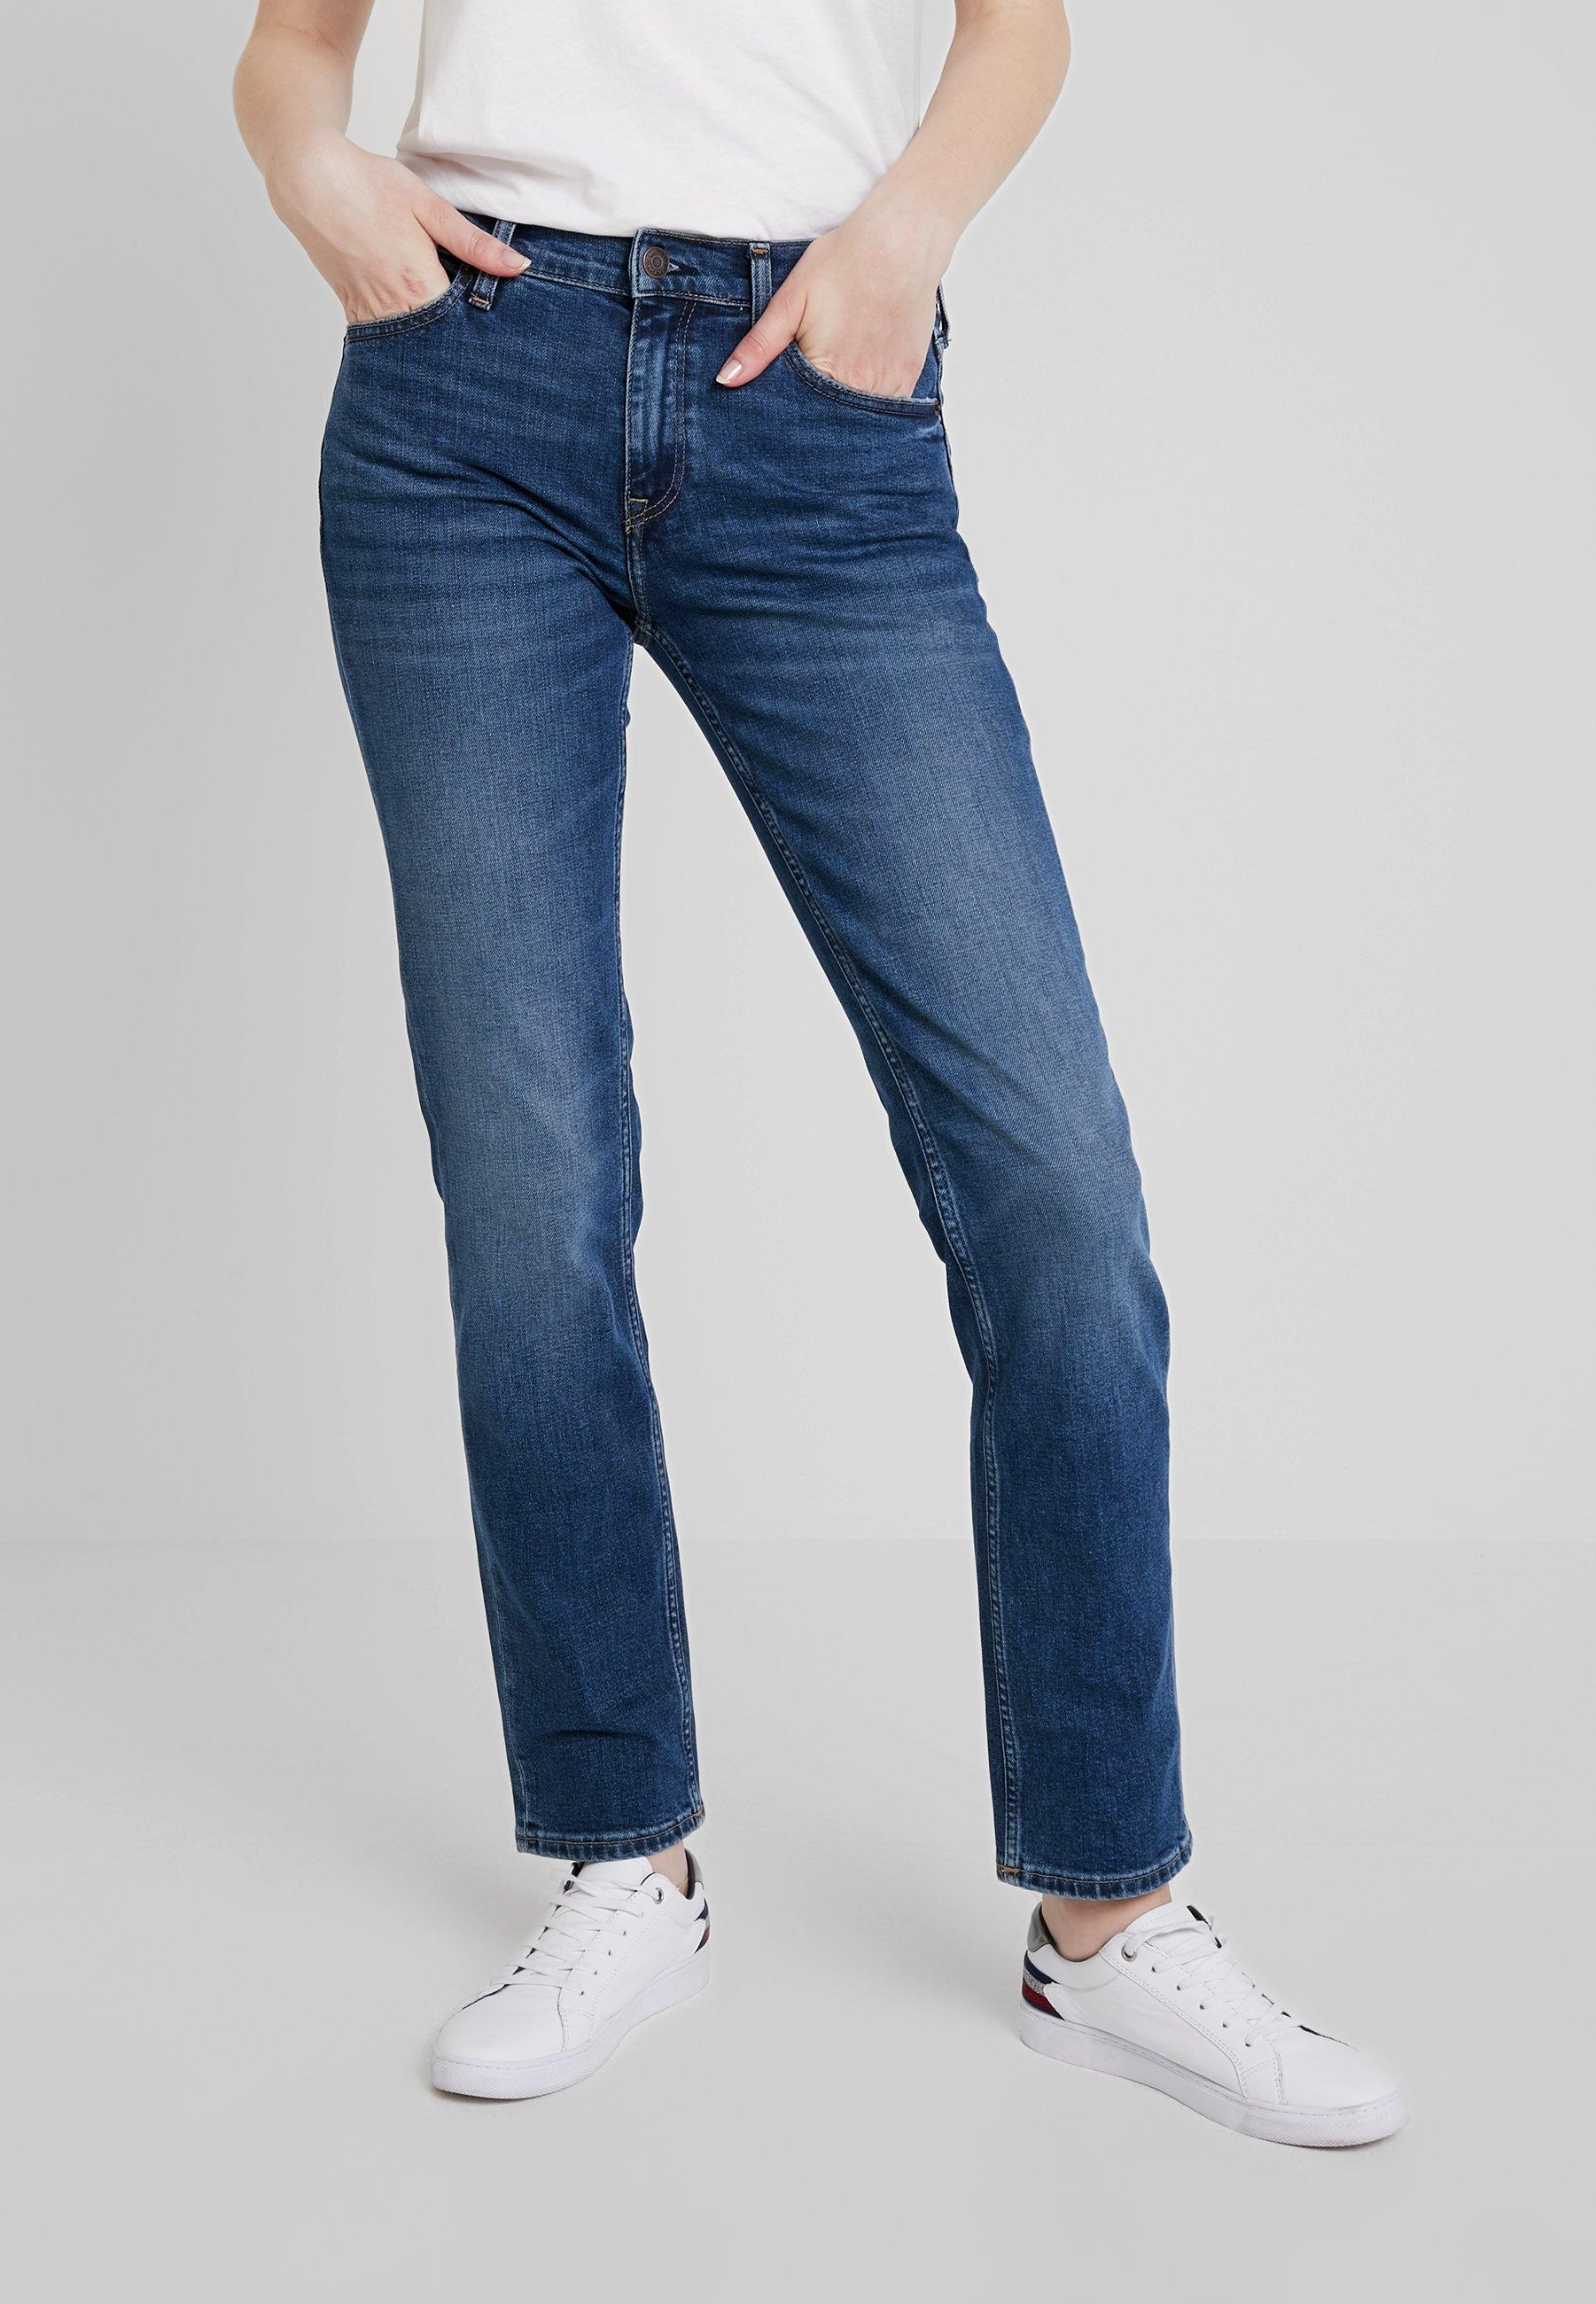 Utah Tommy RiseJean Jeans Mid Droit Com Bl dBeorCx